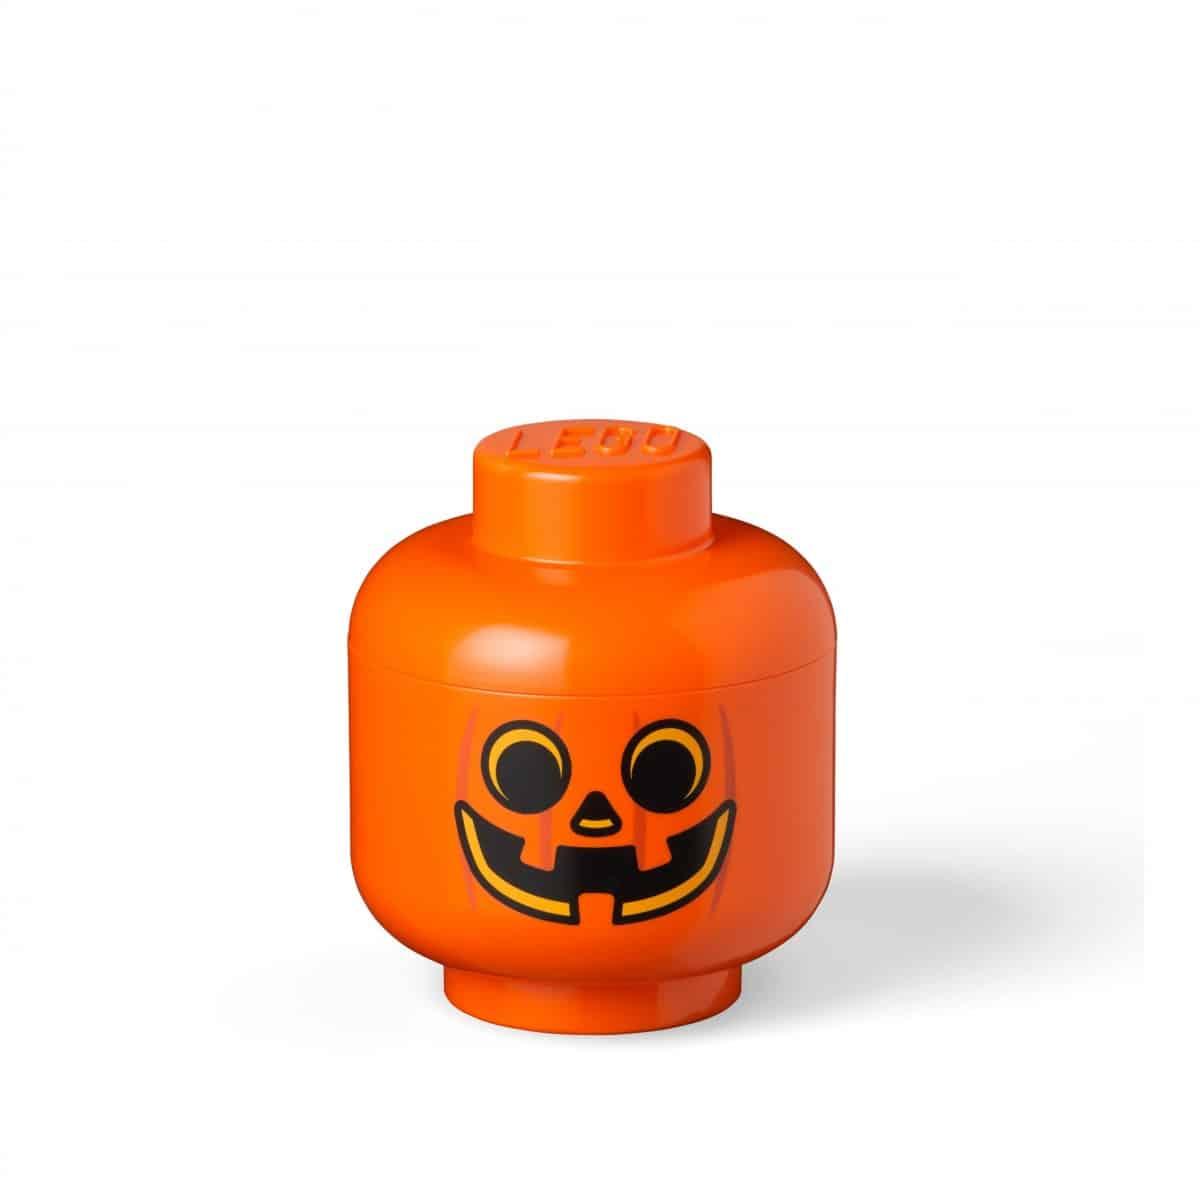 lego 5005886 pumpkin storage head scaled